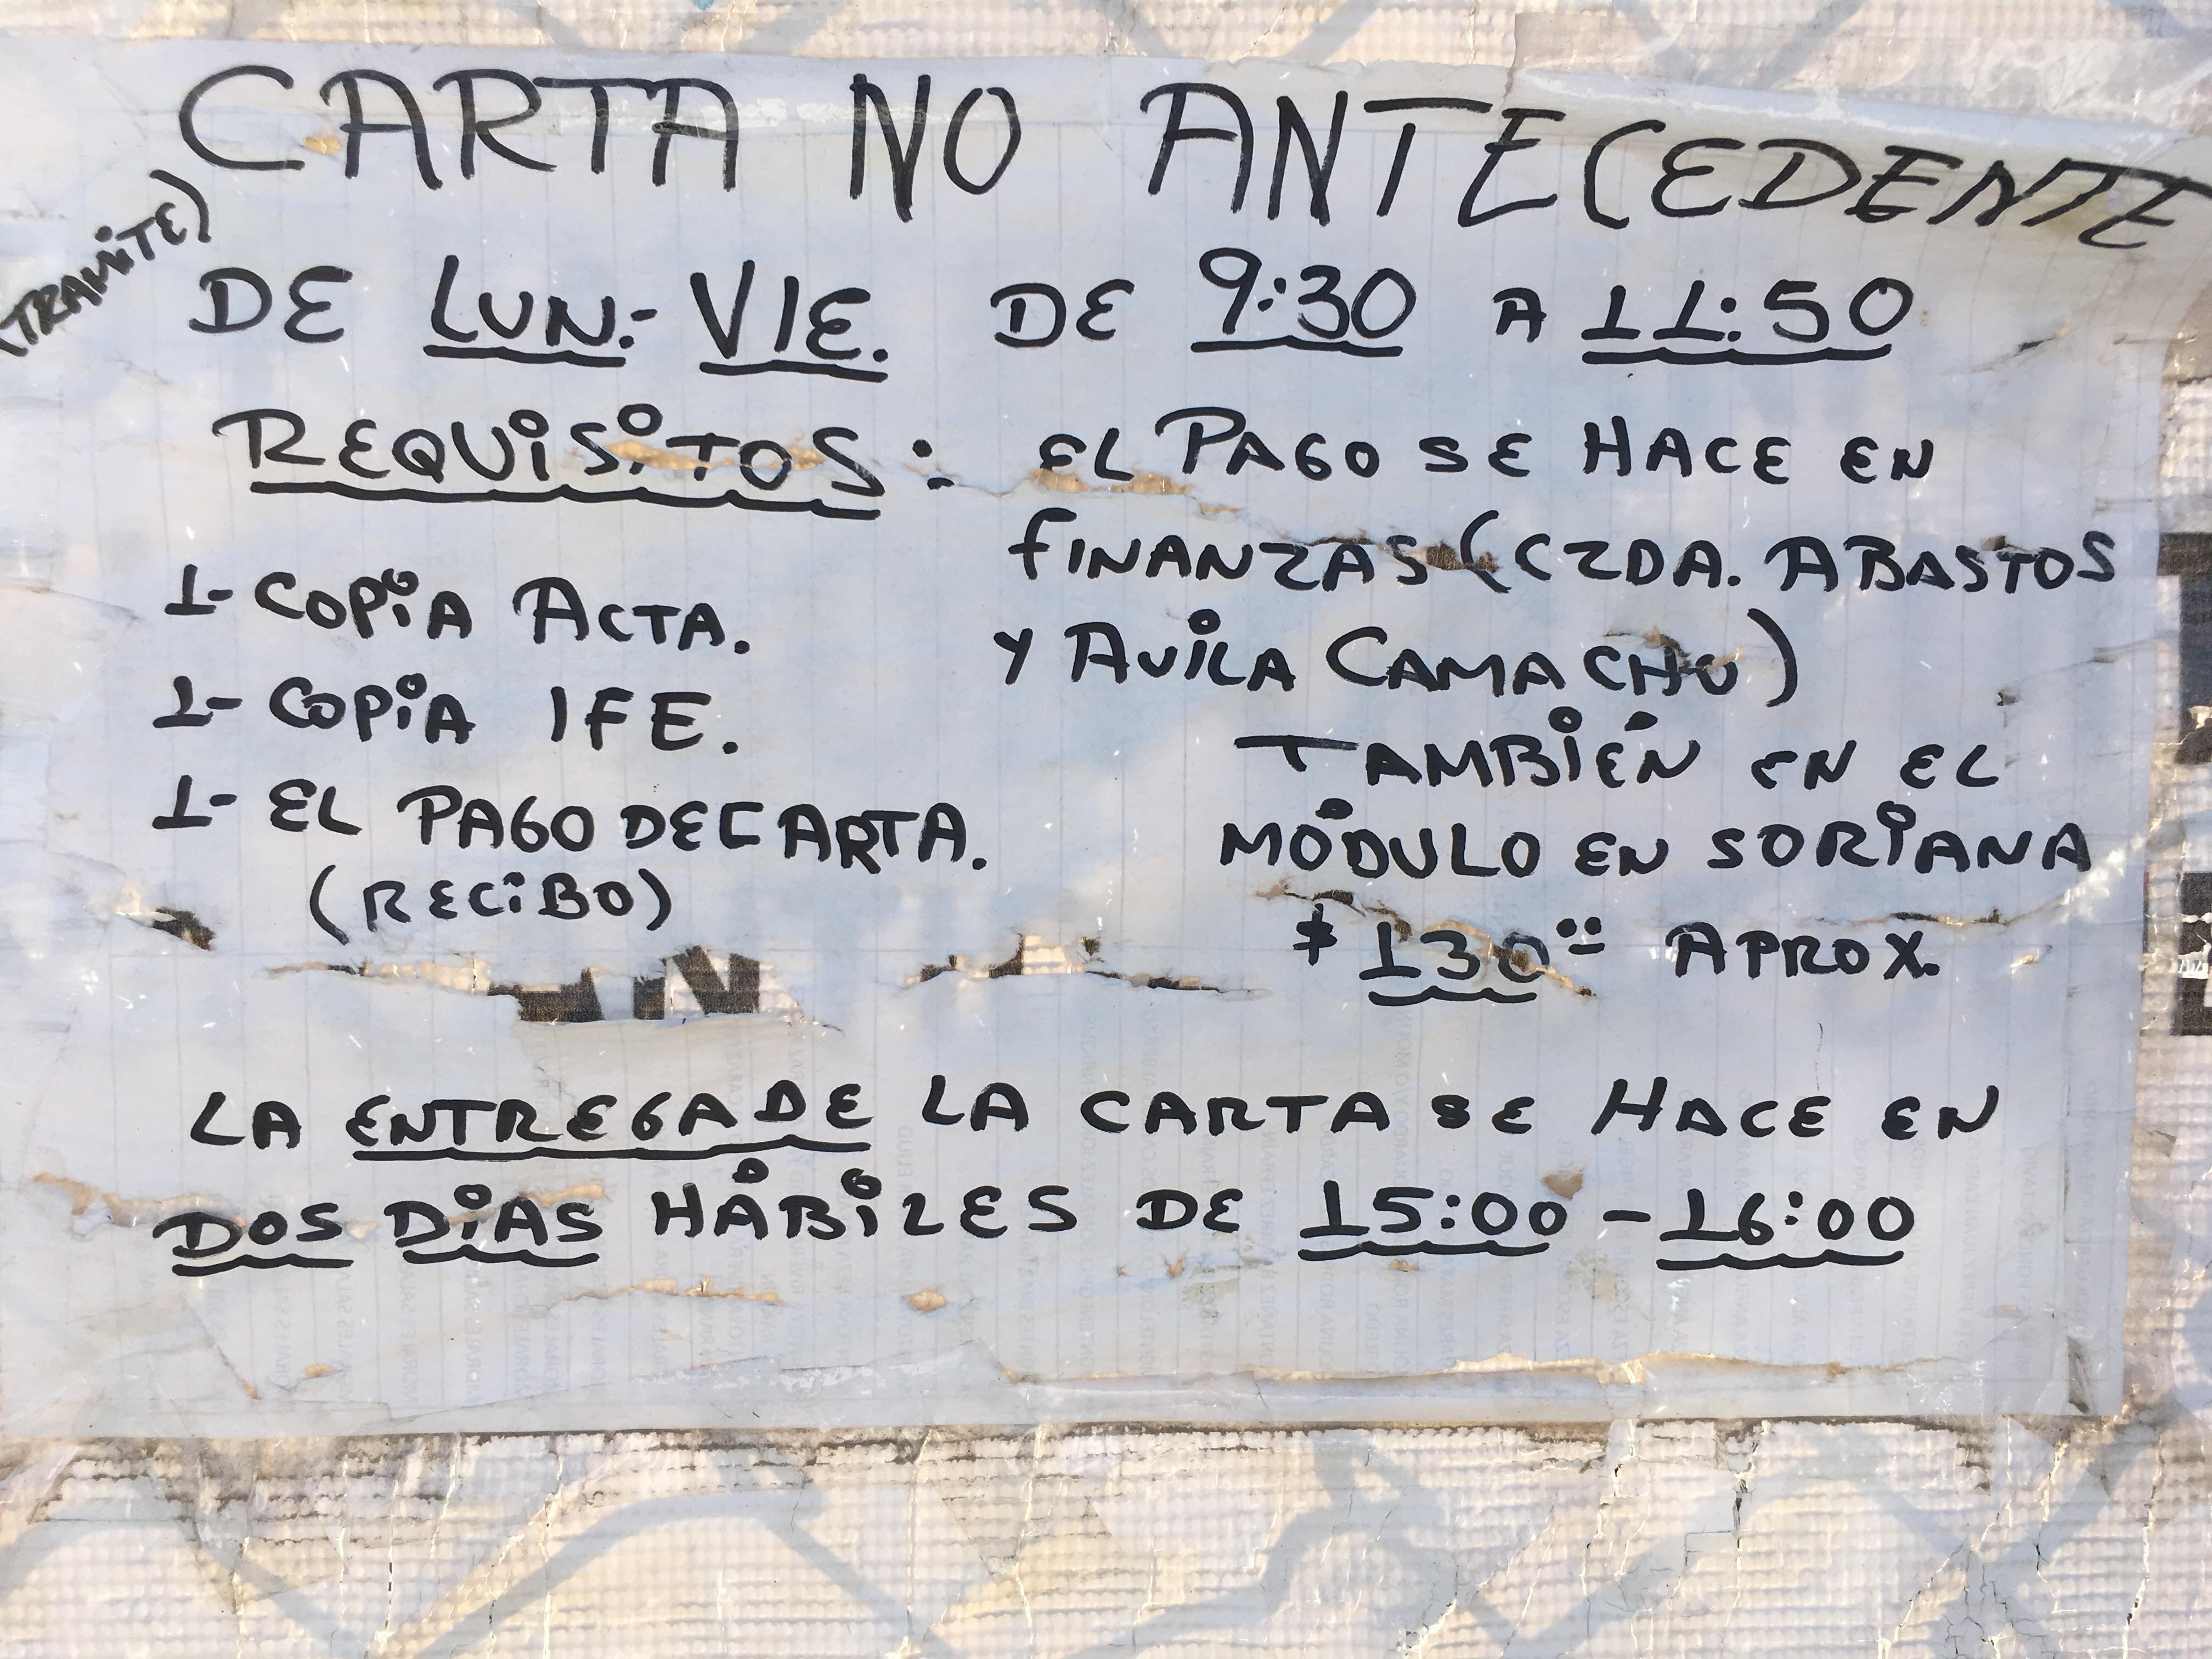 Carta de No Antecedentes Penales Torreón